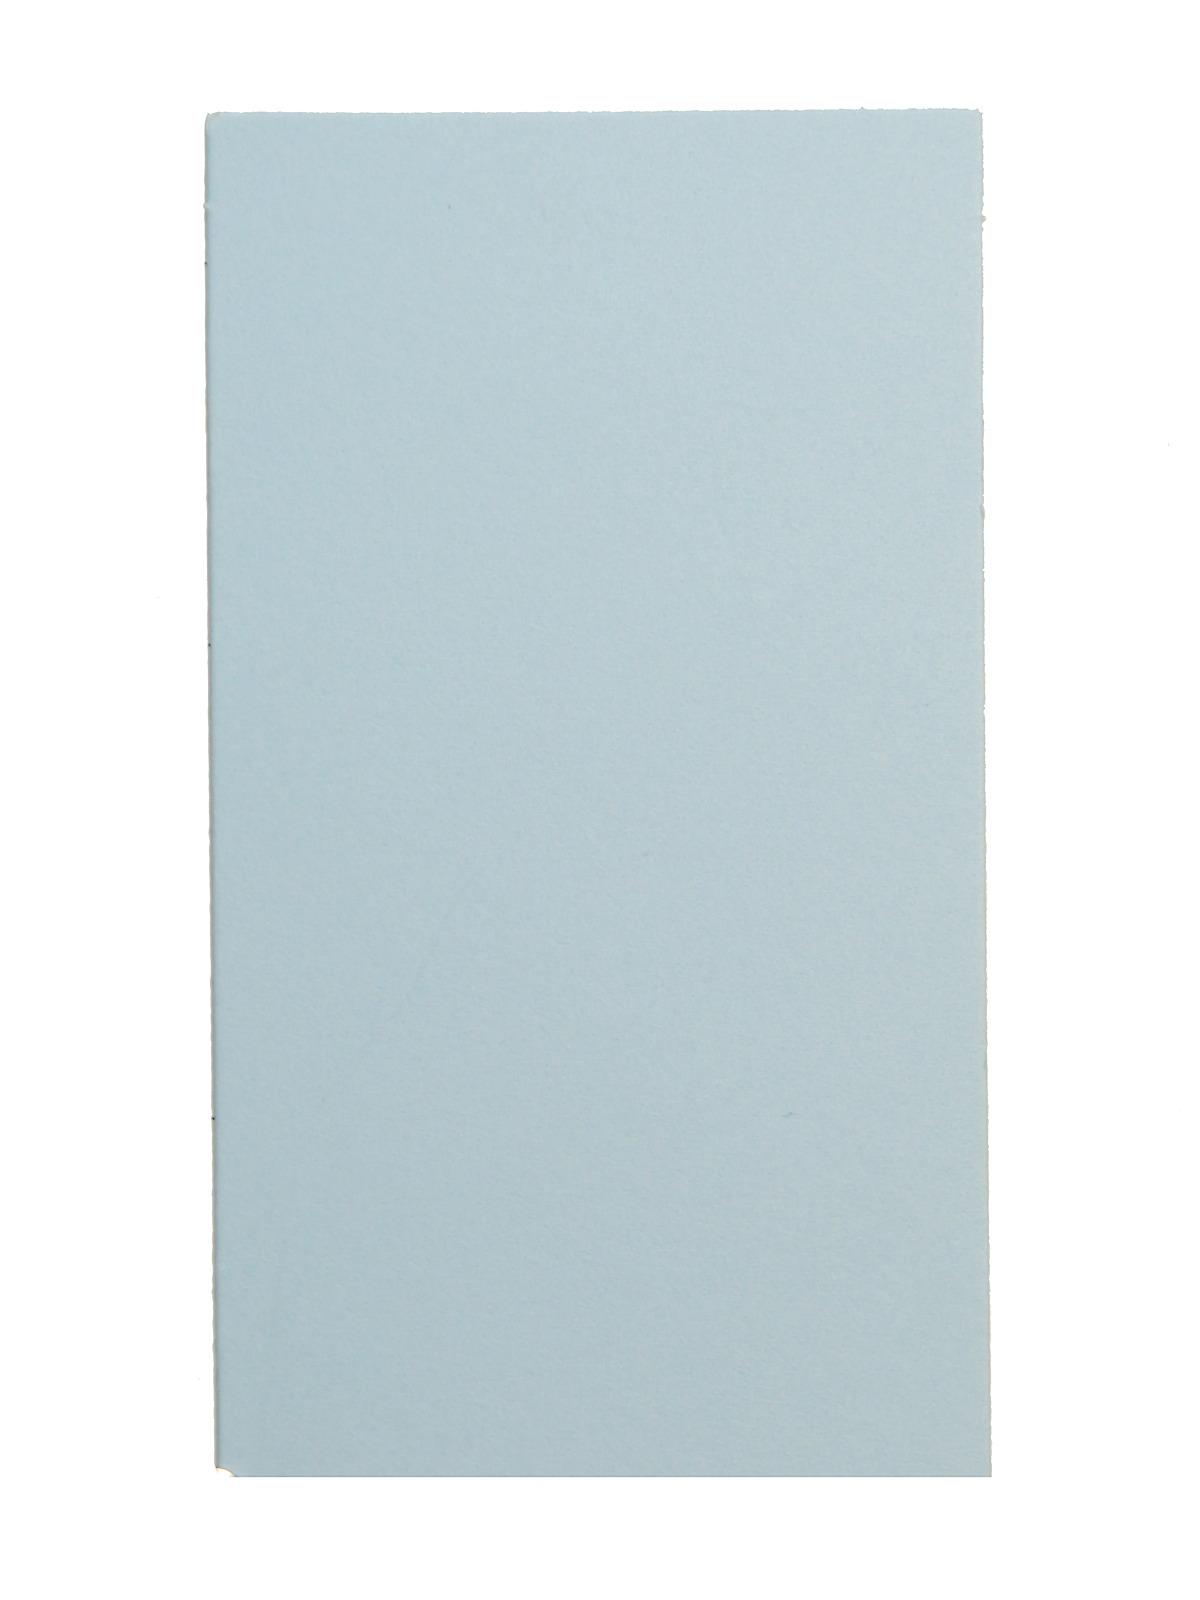 Crescent berkshire mat board misterart berkshire mat board fountain blue 32 in x 40 in cream core geenschuldenfo Images